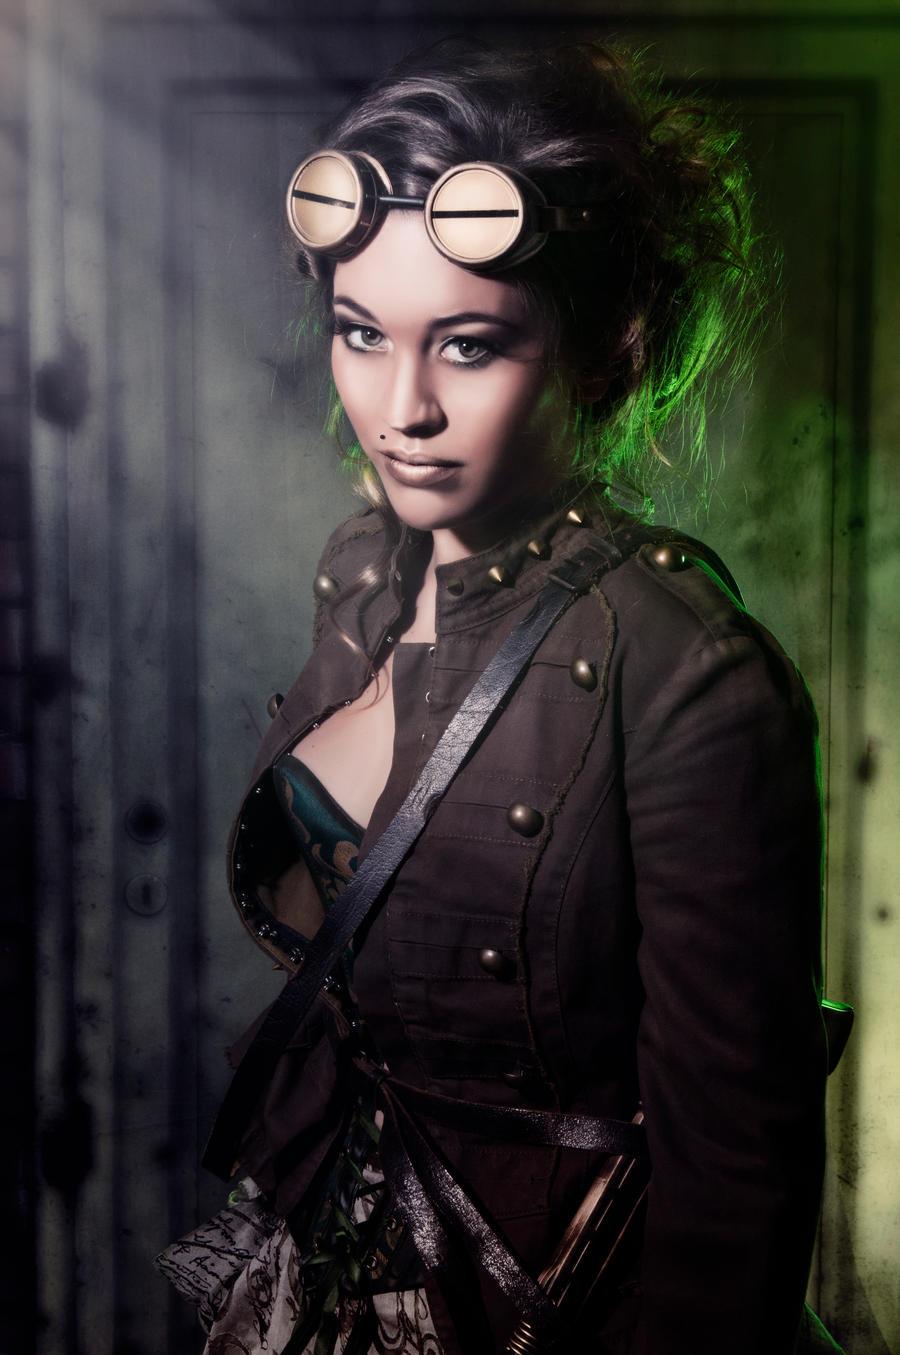 Steam girl by aalsina on deviantart - Steamgirl download ...